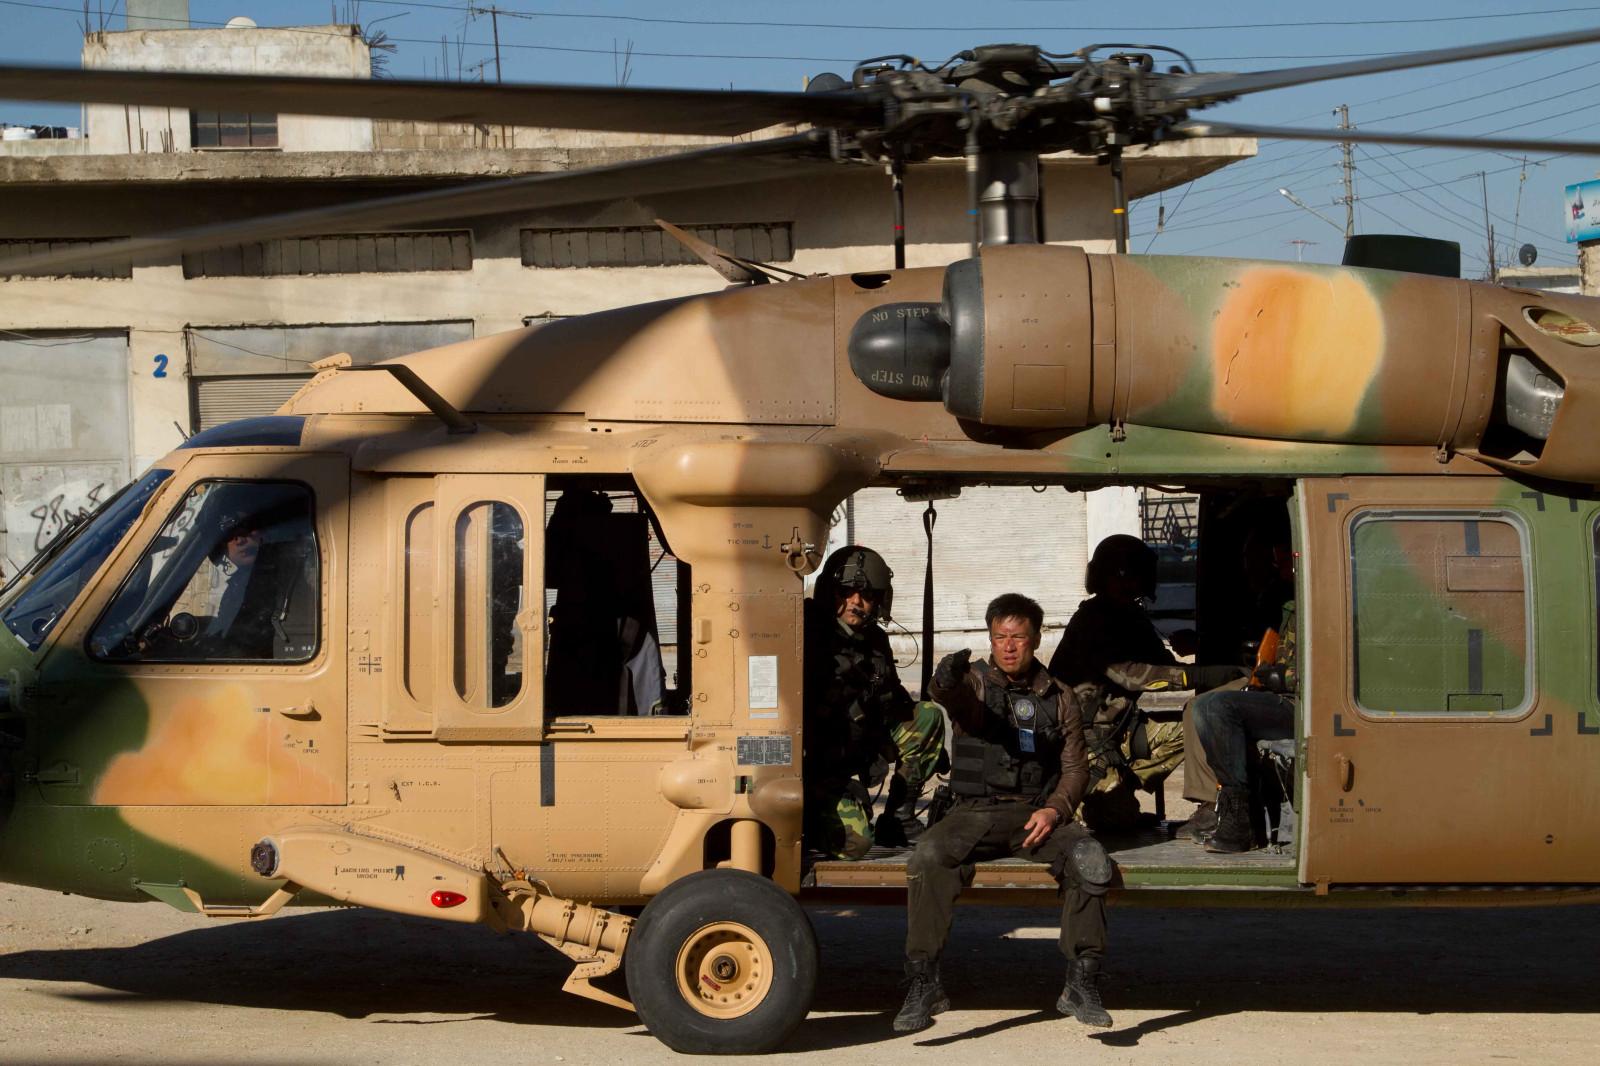 10 飞机 直升机 1600_1066